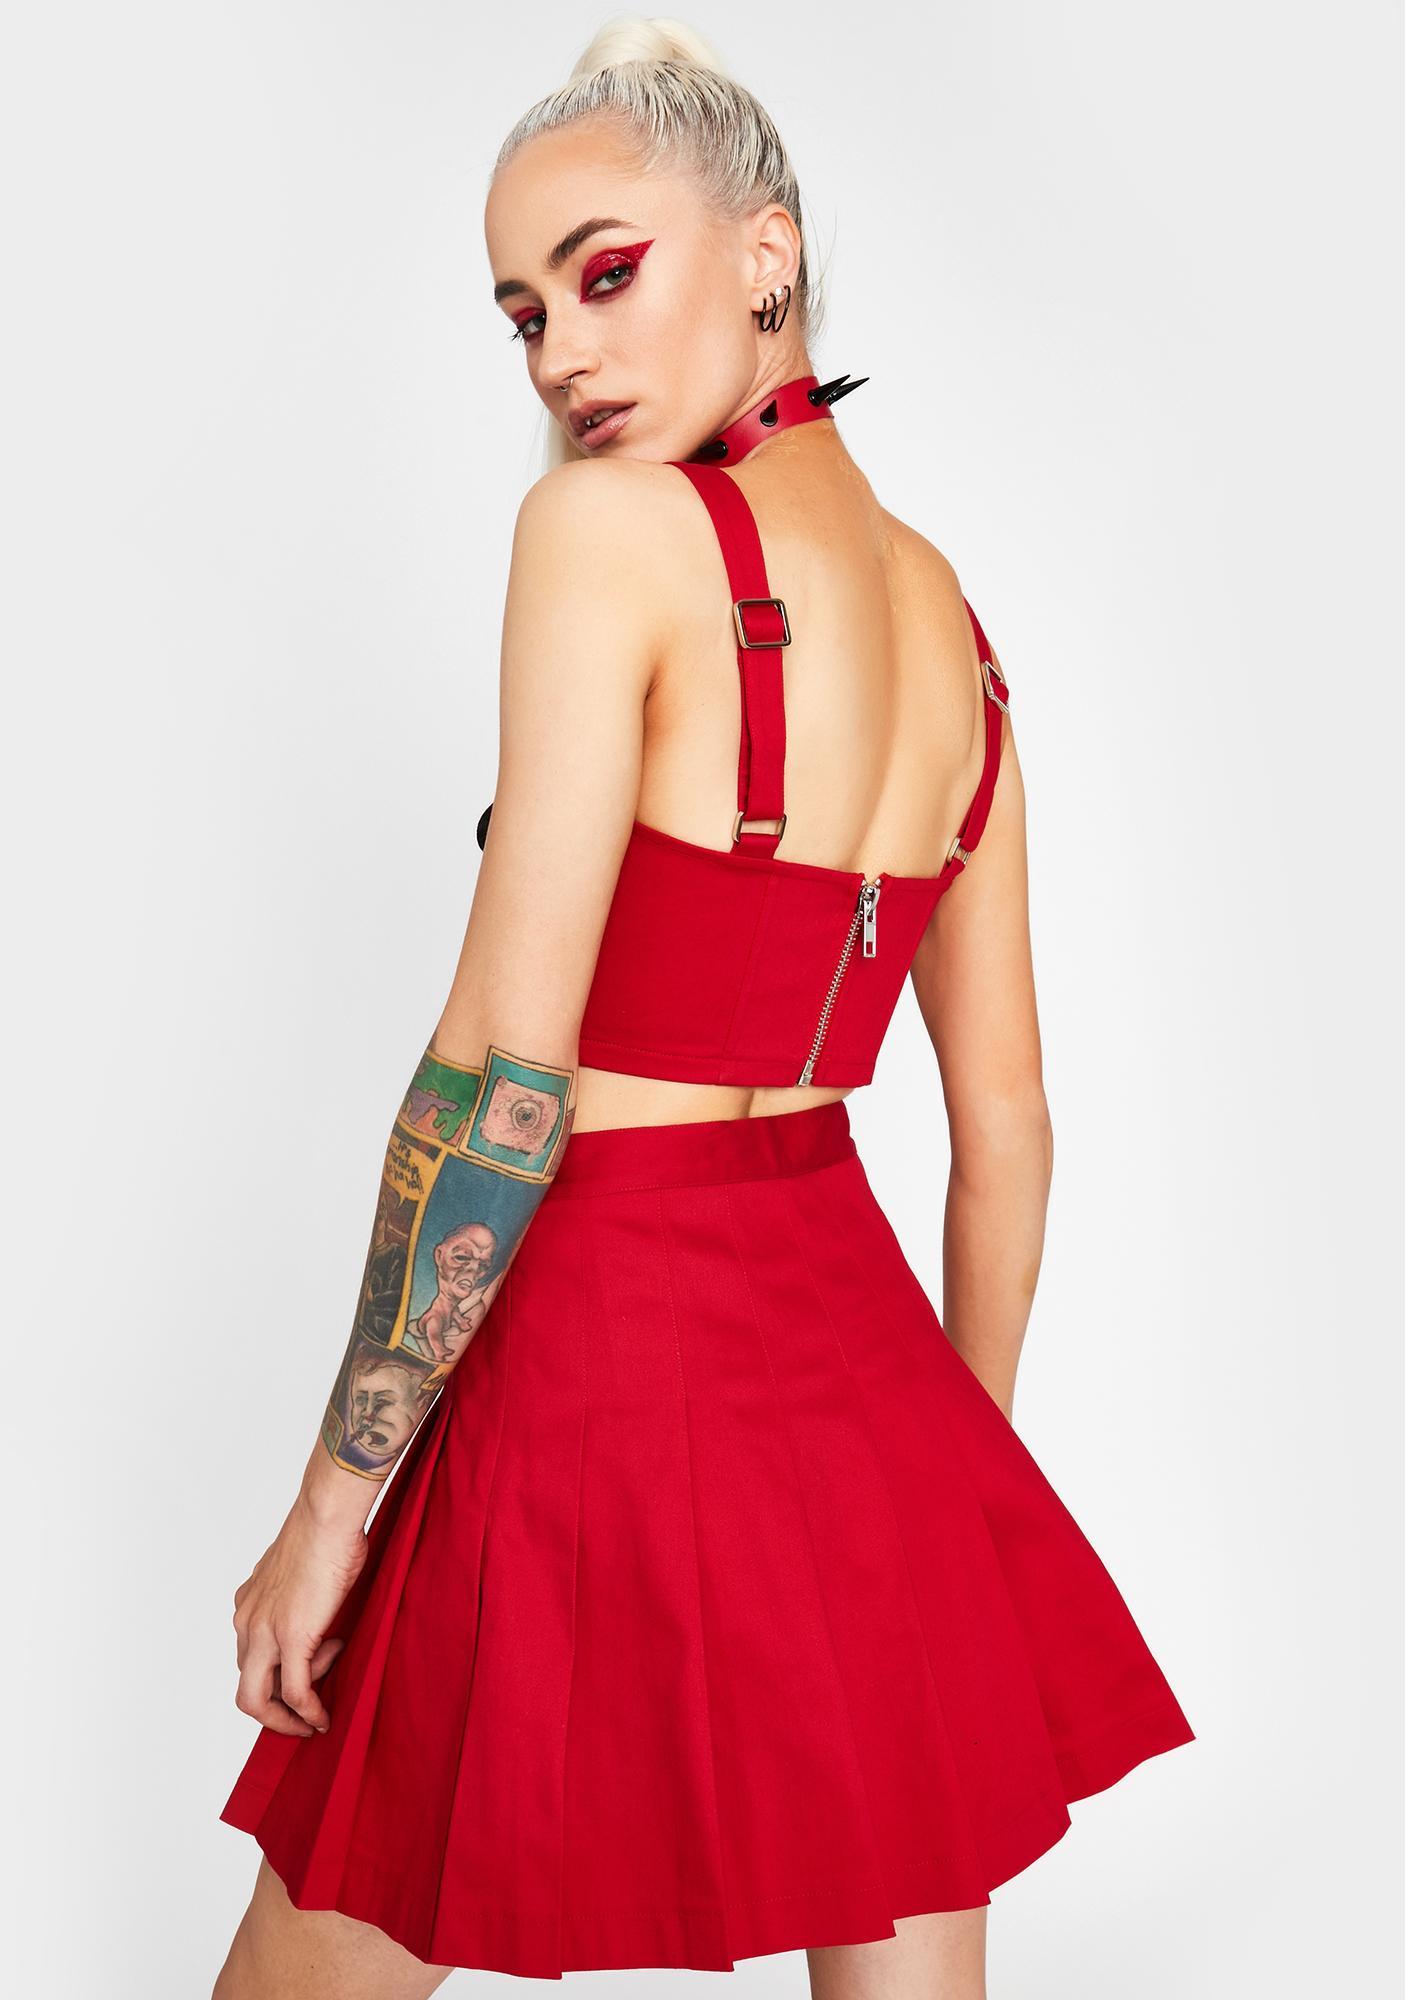 HOROSCOPEZ Fierce N' Flirtatious Pleated Skirt